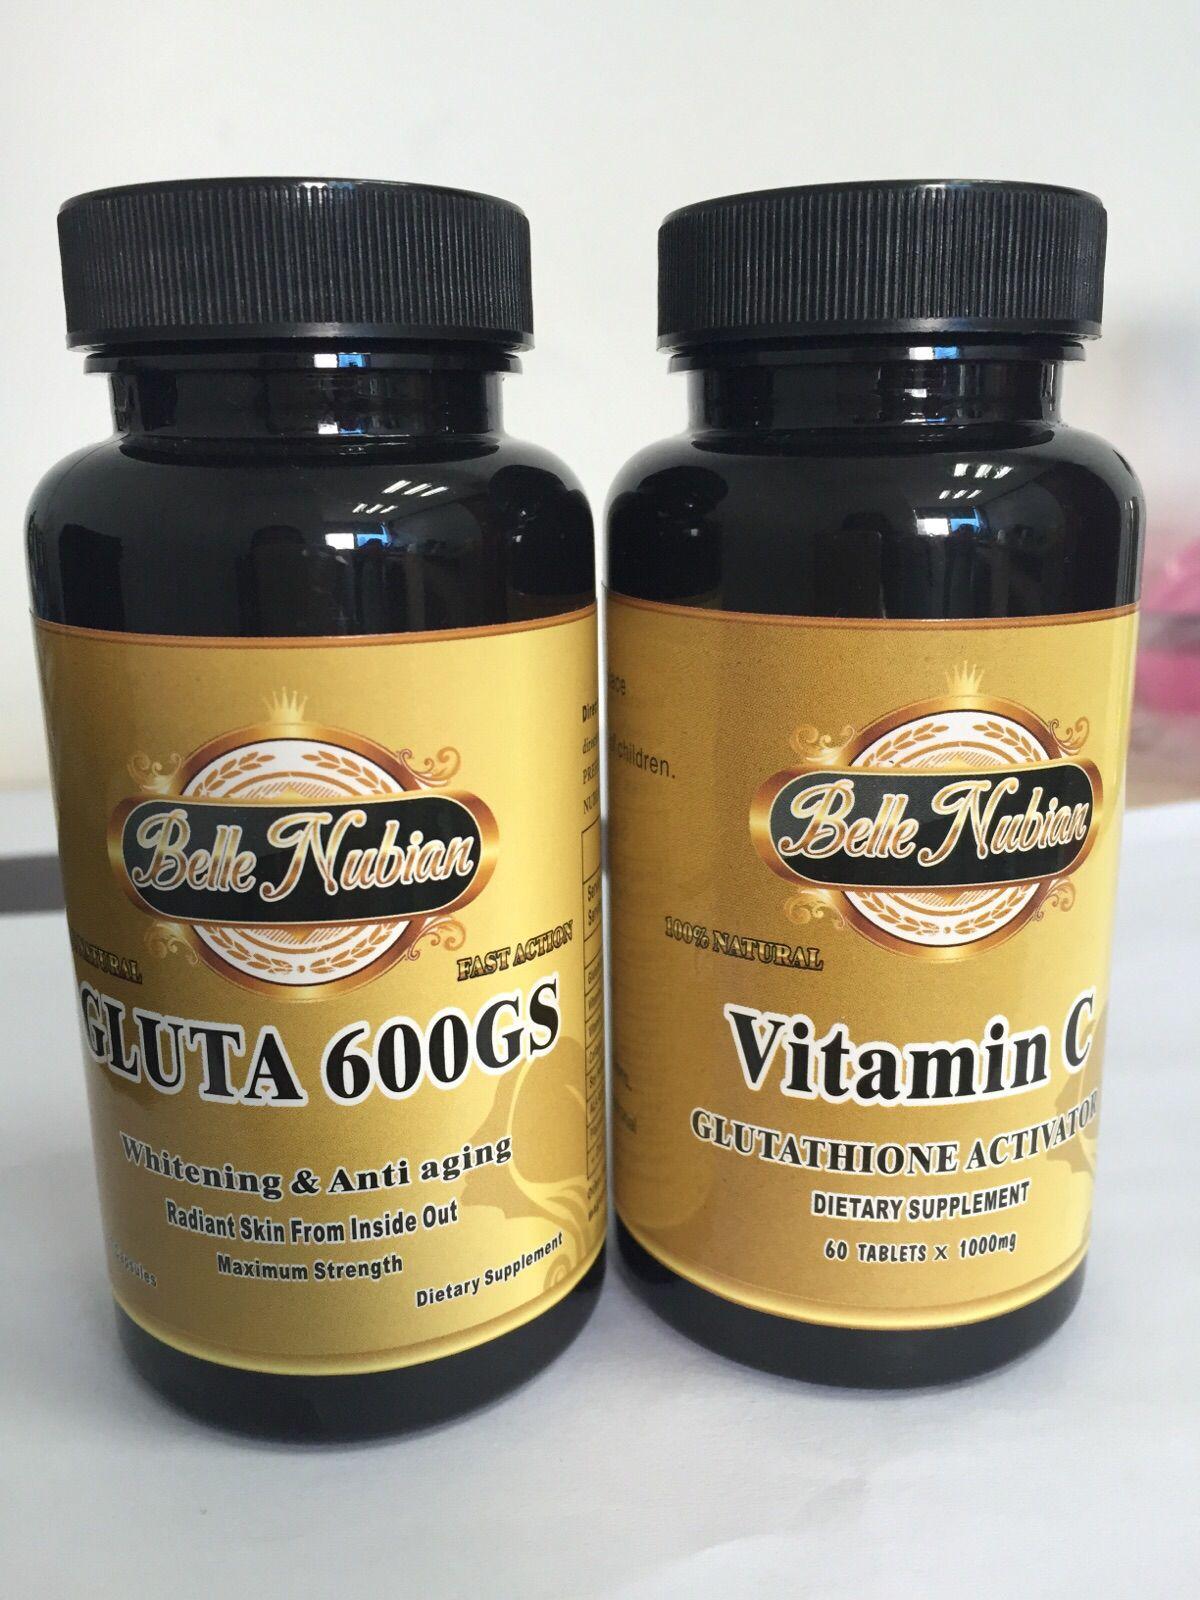 Pin on Belle nubian glutathione pills